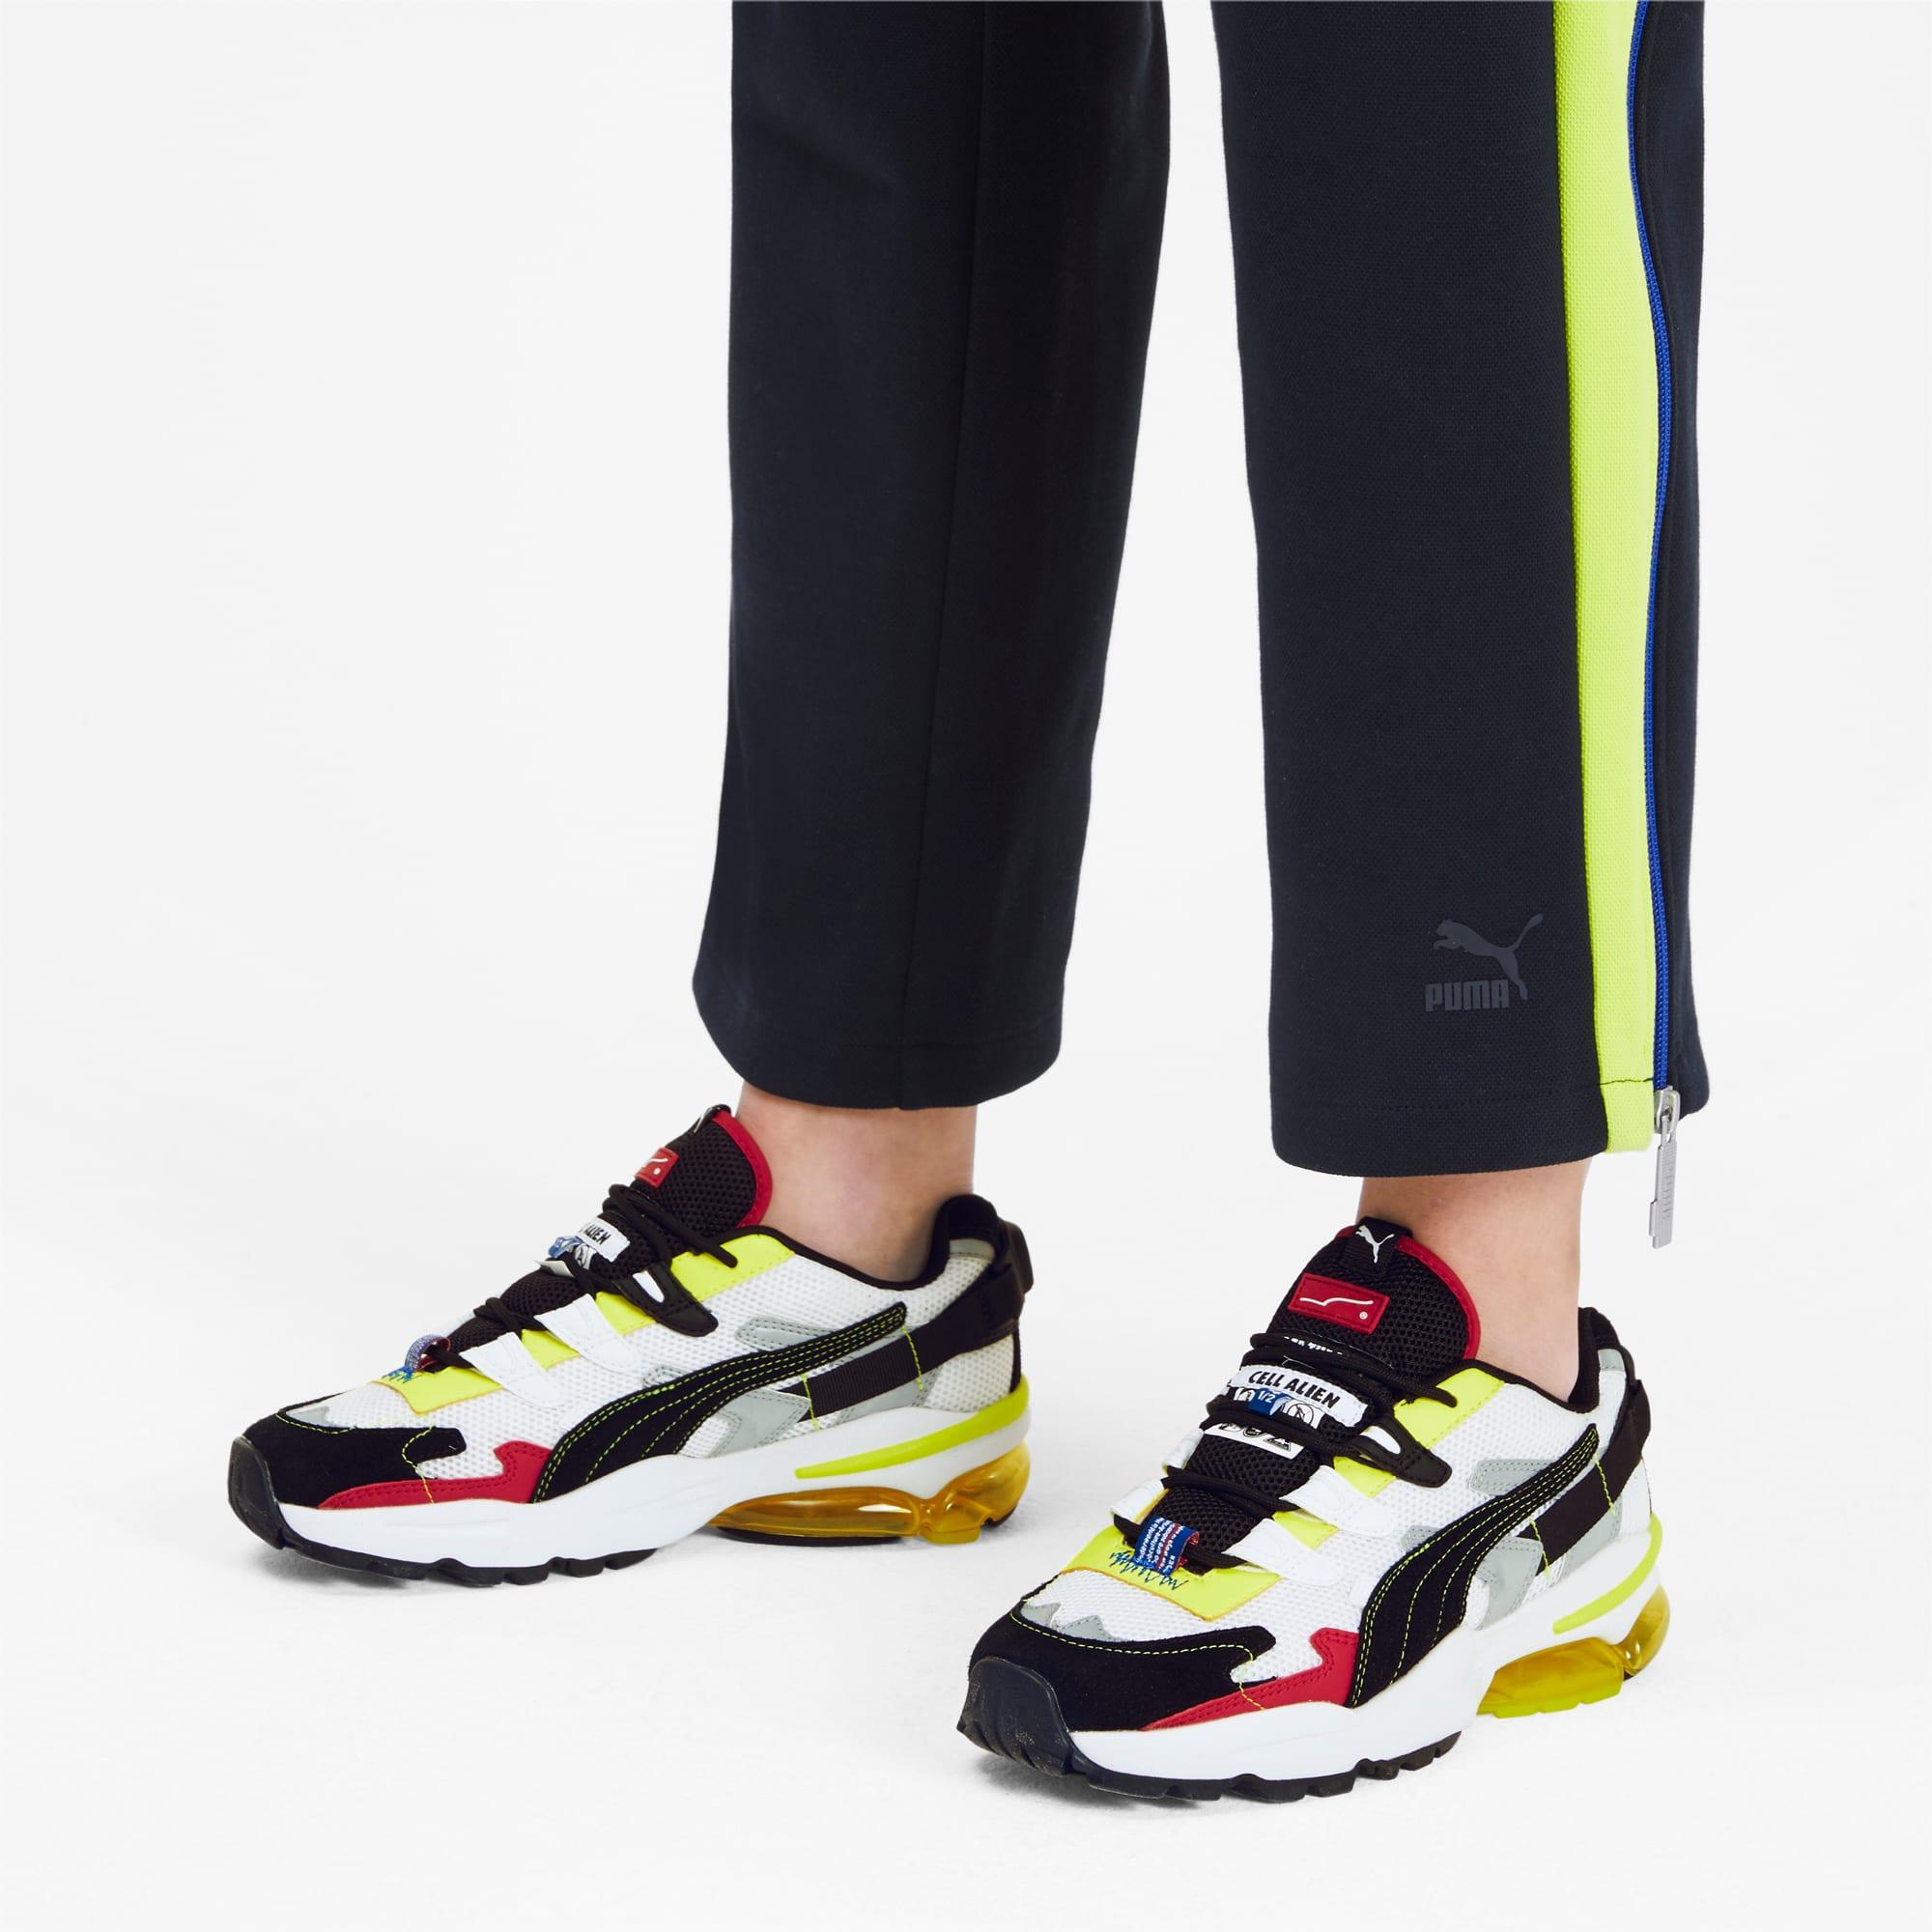 PUMA x ADER ERROR CELL Alien Sneakers